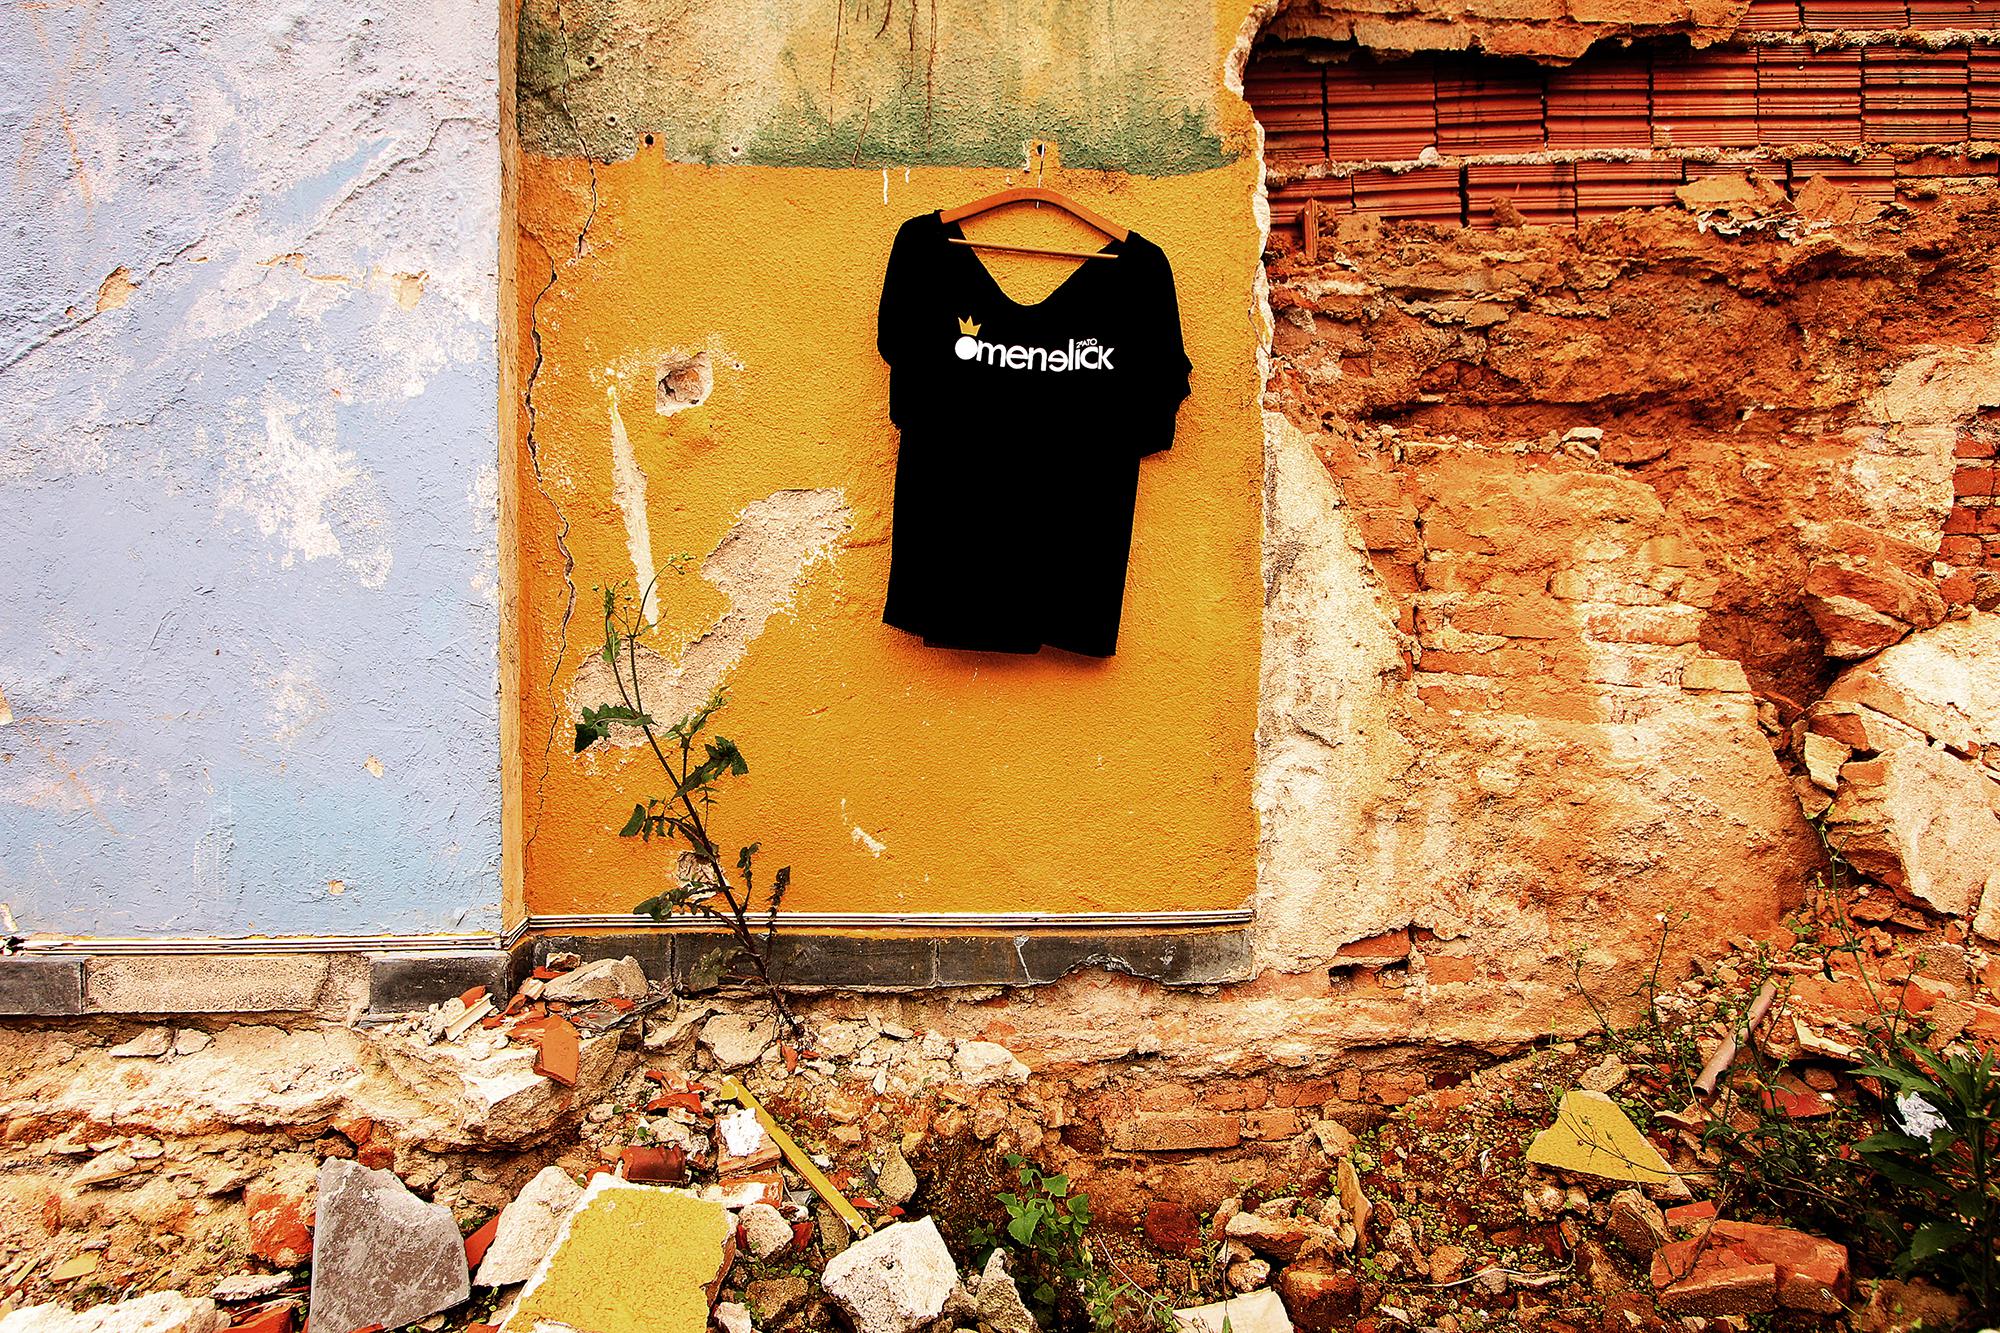 http://omenelick2ato.com/files/gimgs/313_t-shirt.jpg